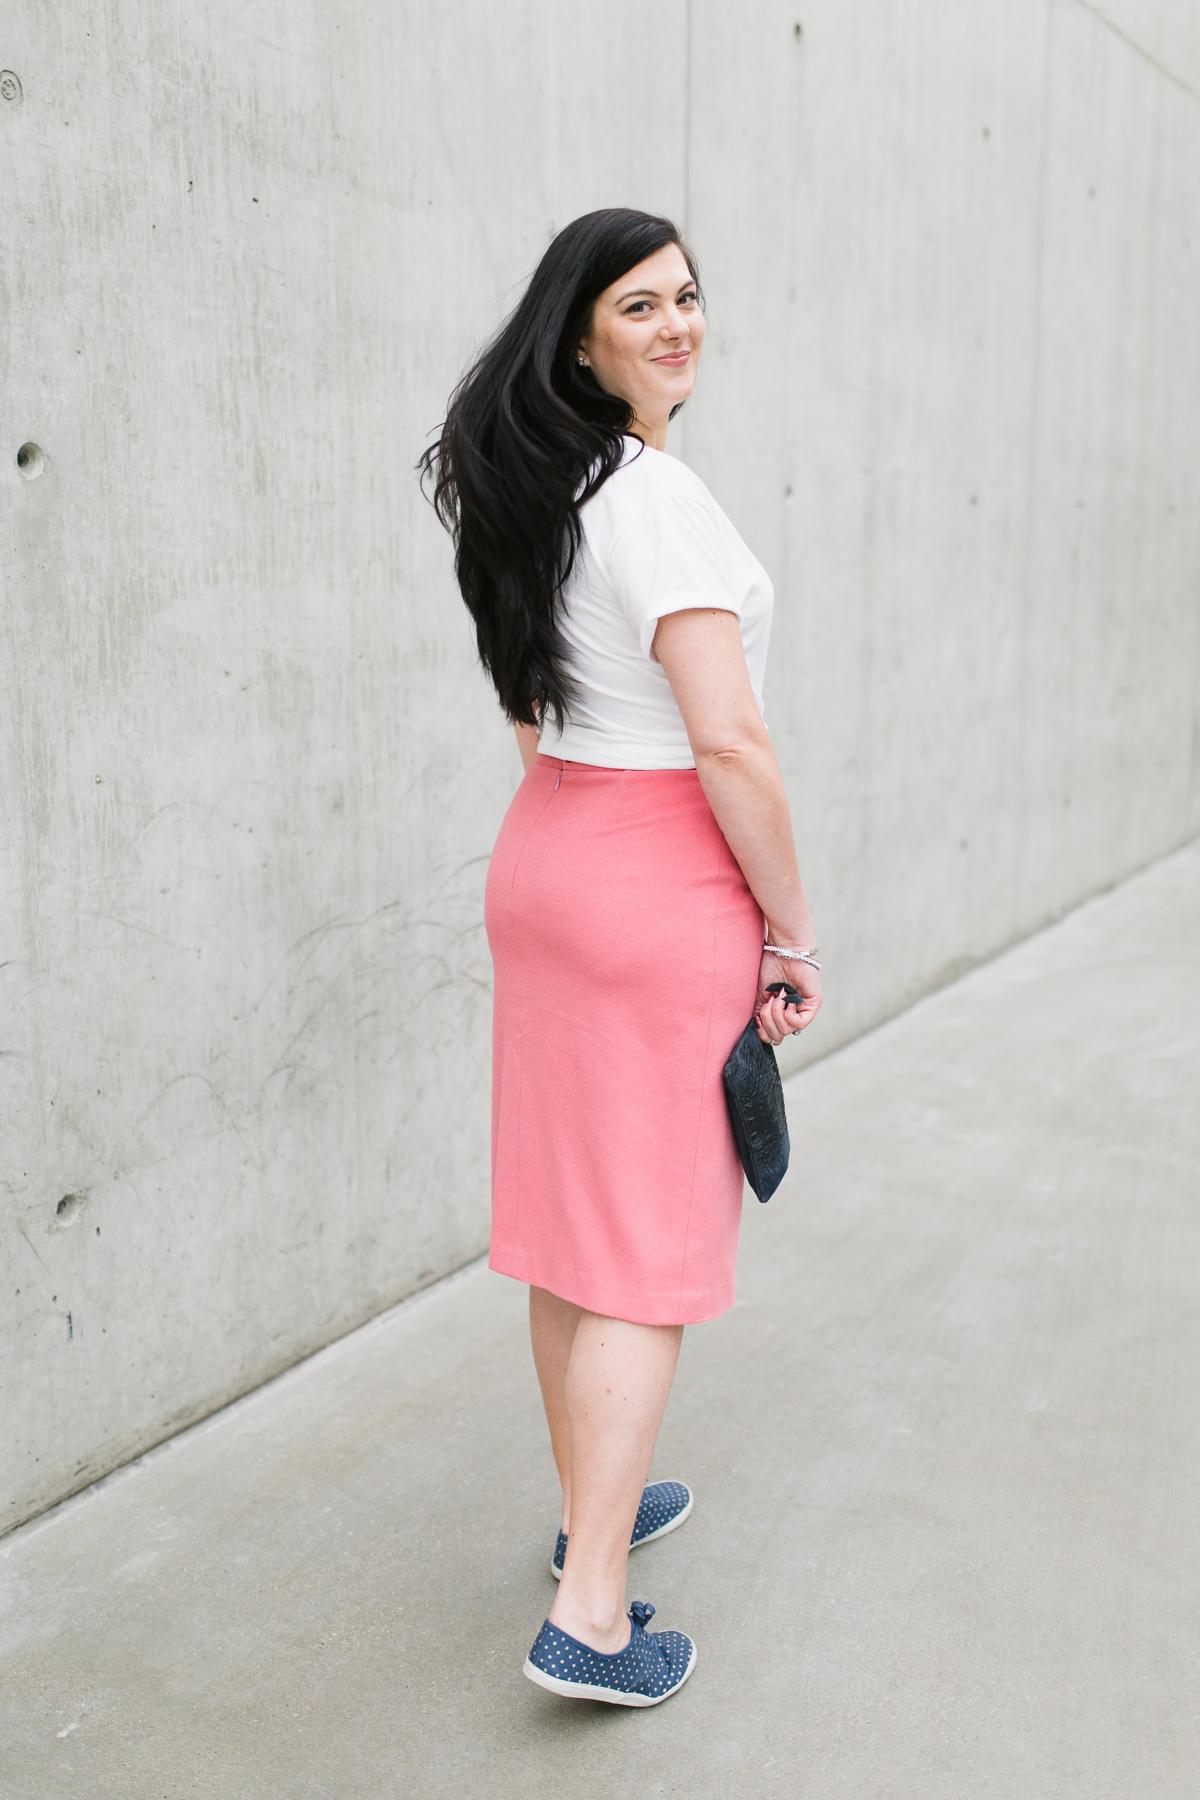 AN_PnP_Fashion-PinkskirtCasual014.jpg